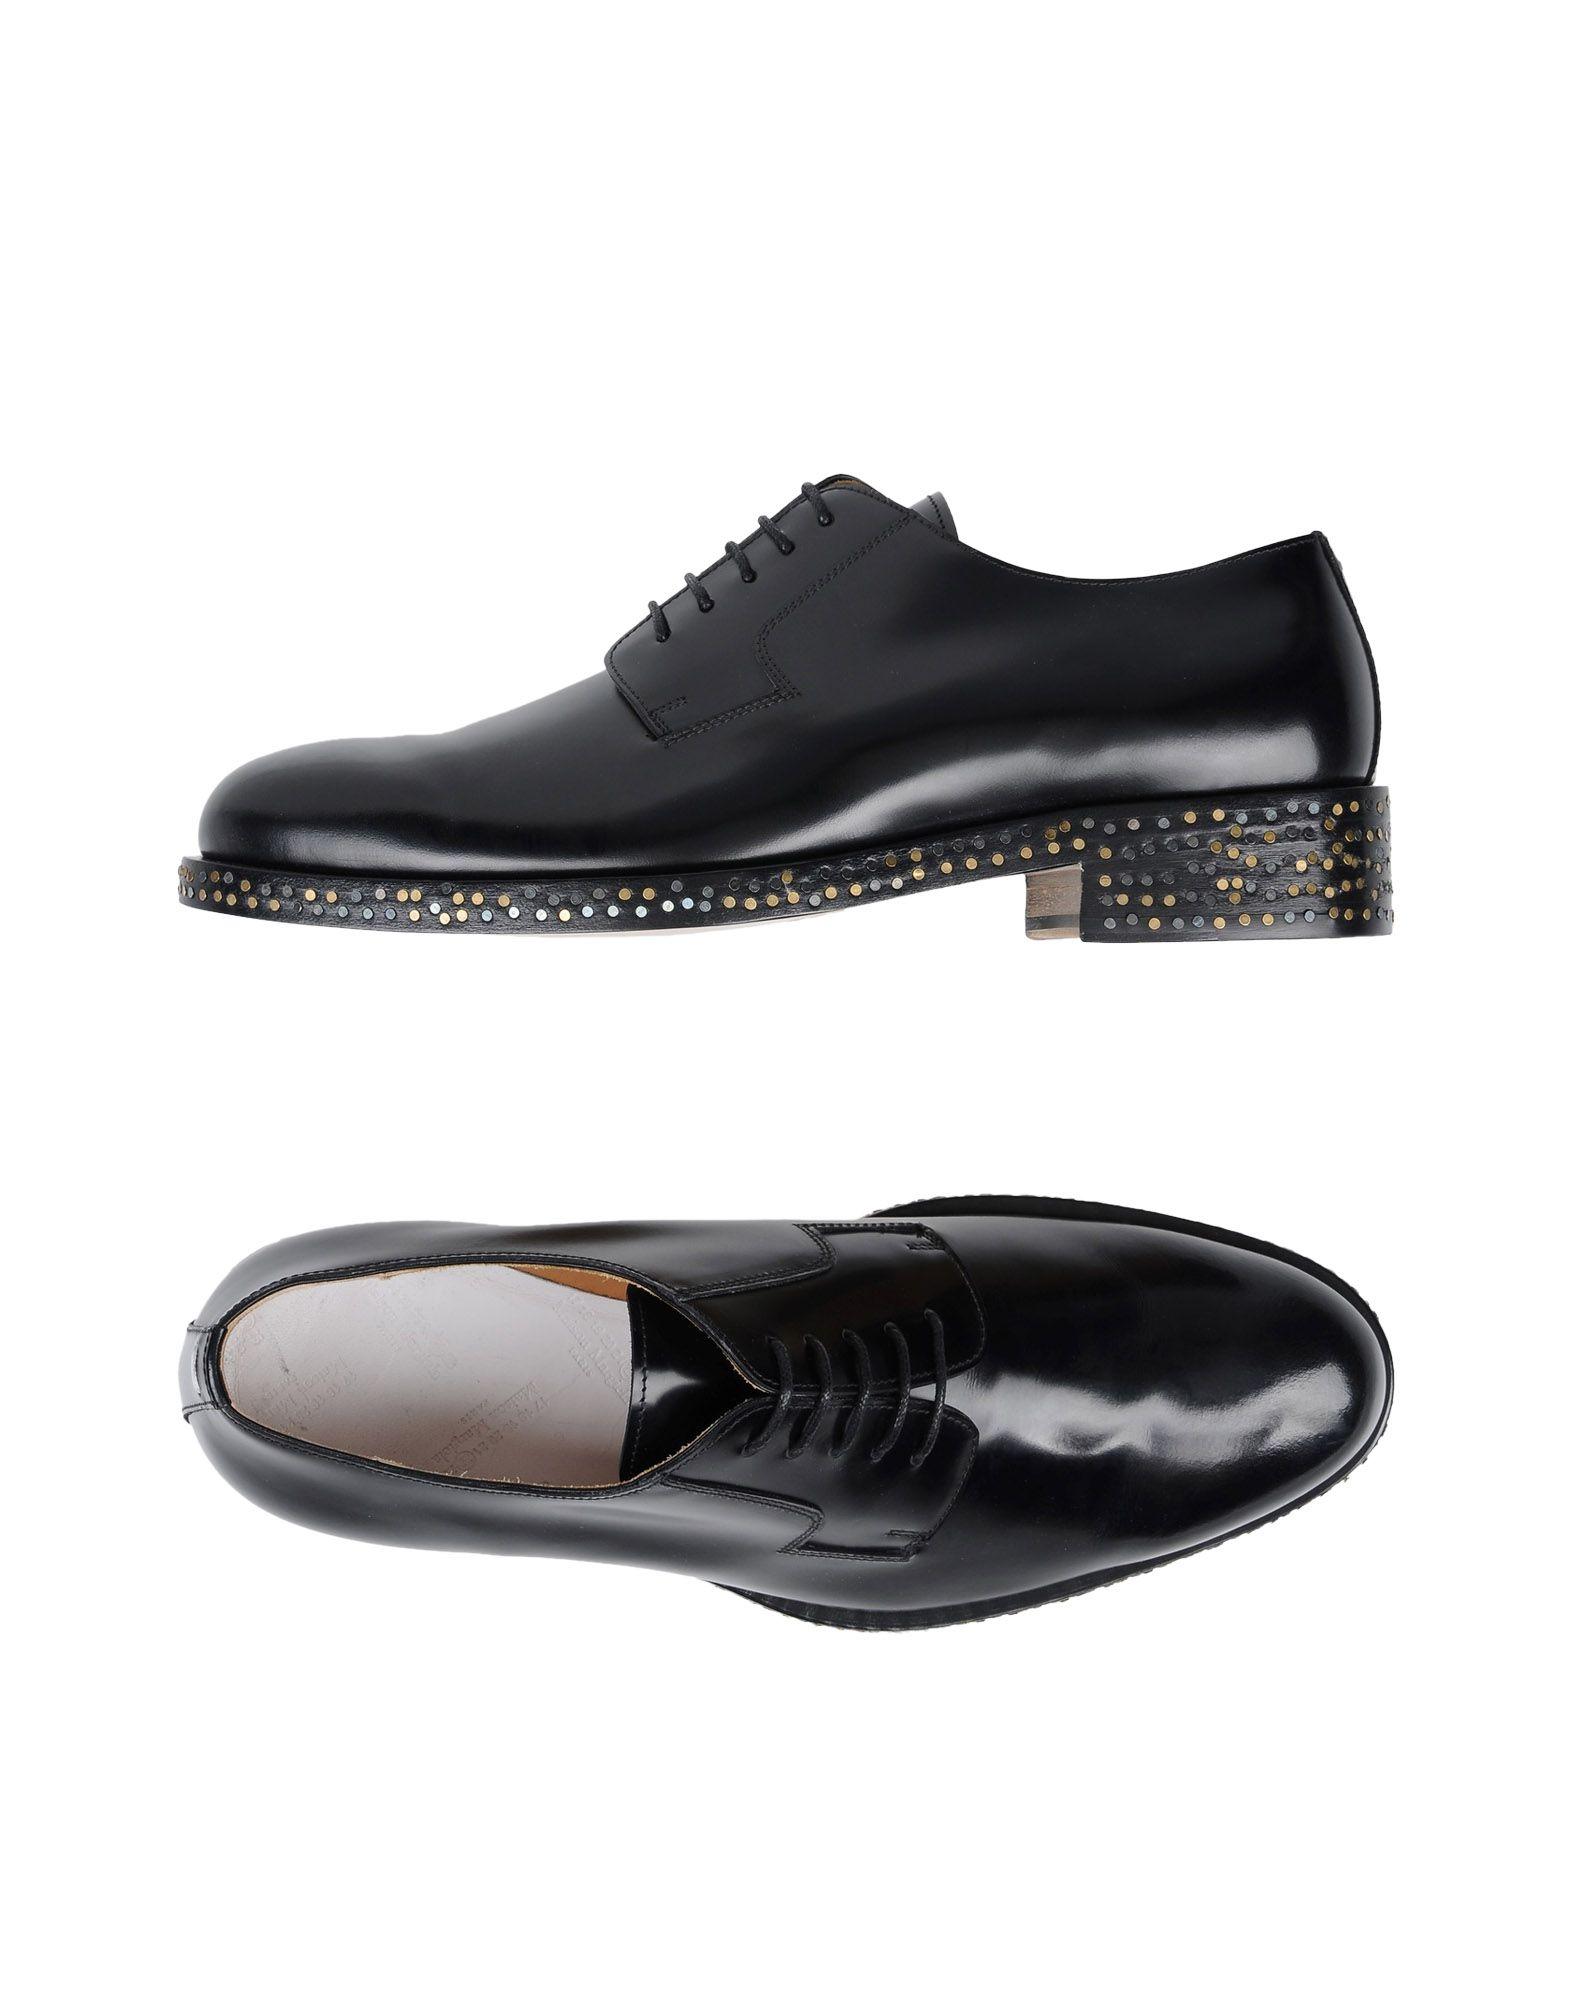 MAISON MARGIELA Обувь на шнурках maison margiela обувь на шнурках